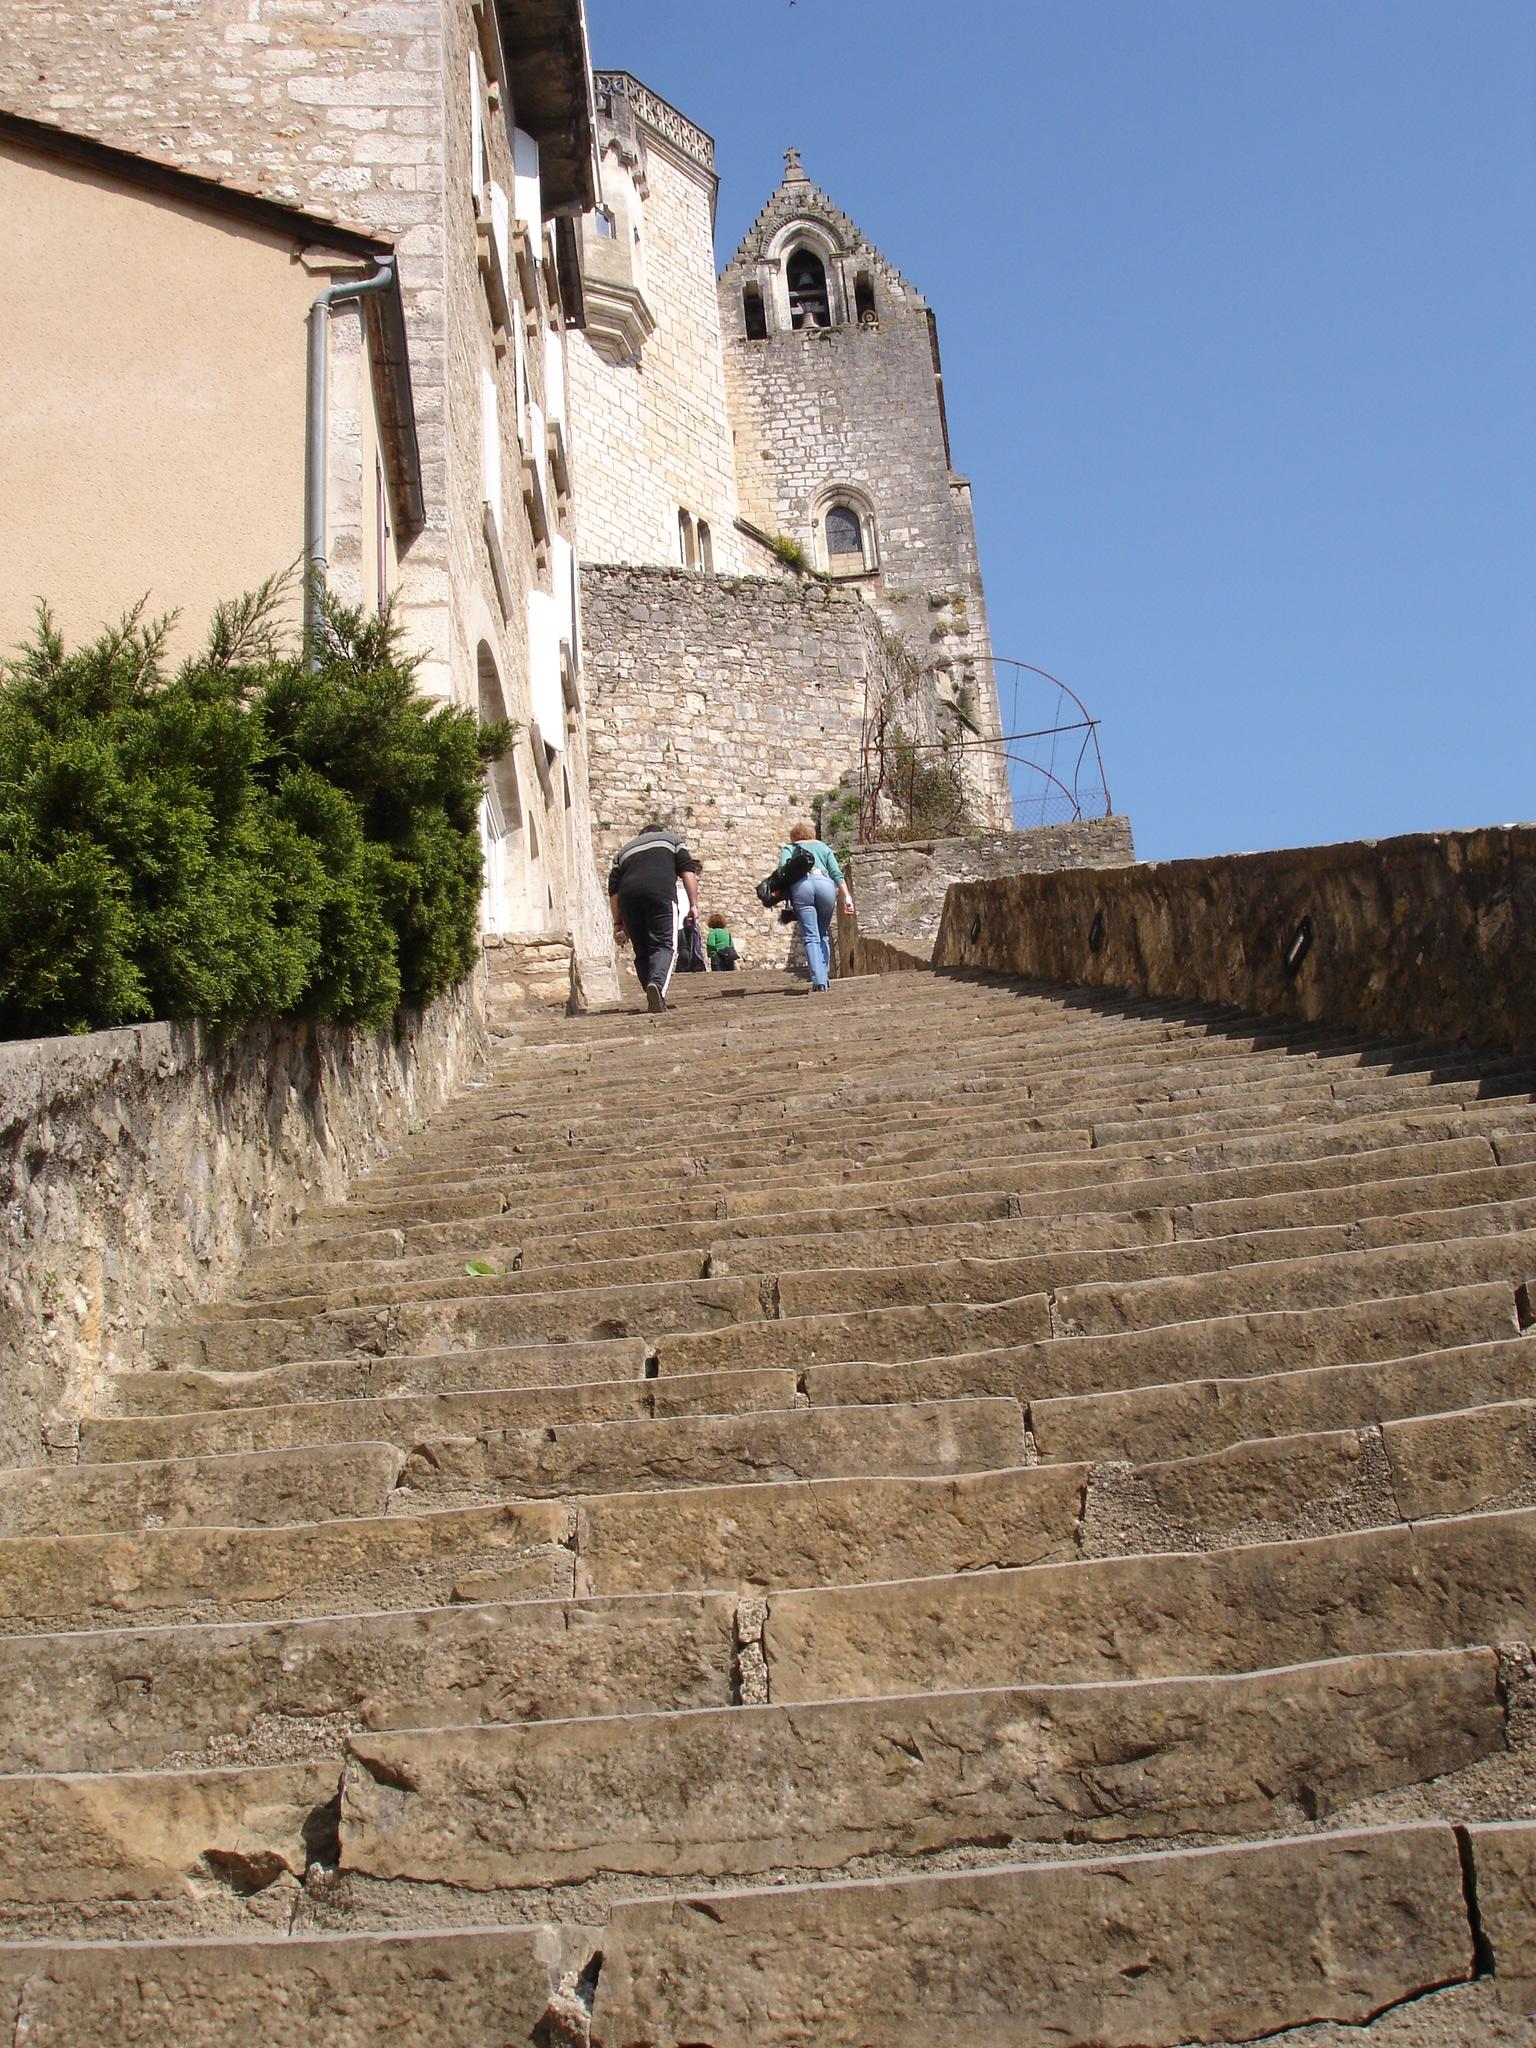 File:France Lot Rocamadour escalier.jpg - Wikimedia Commons